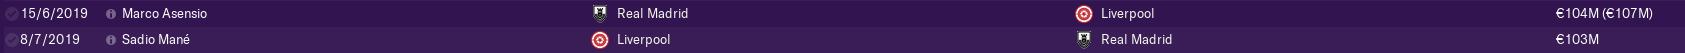 pre-season-100m-transfers-trade.png